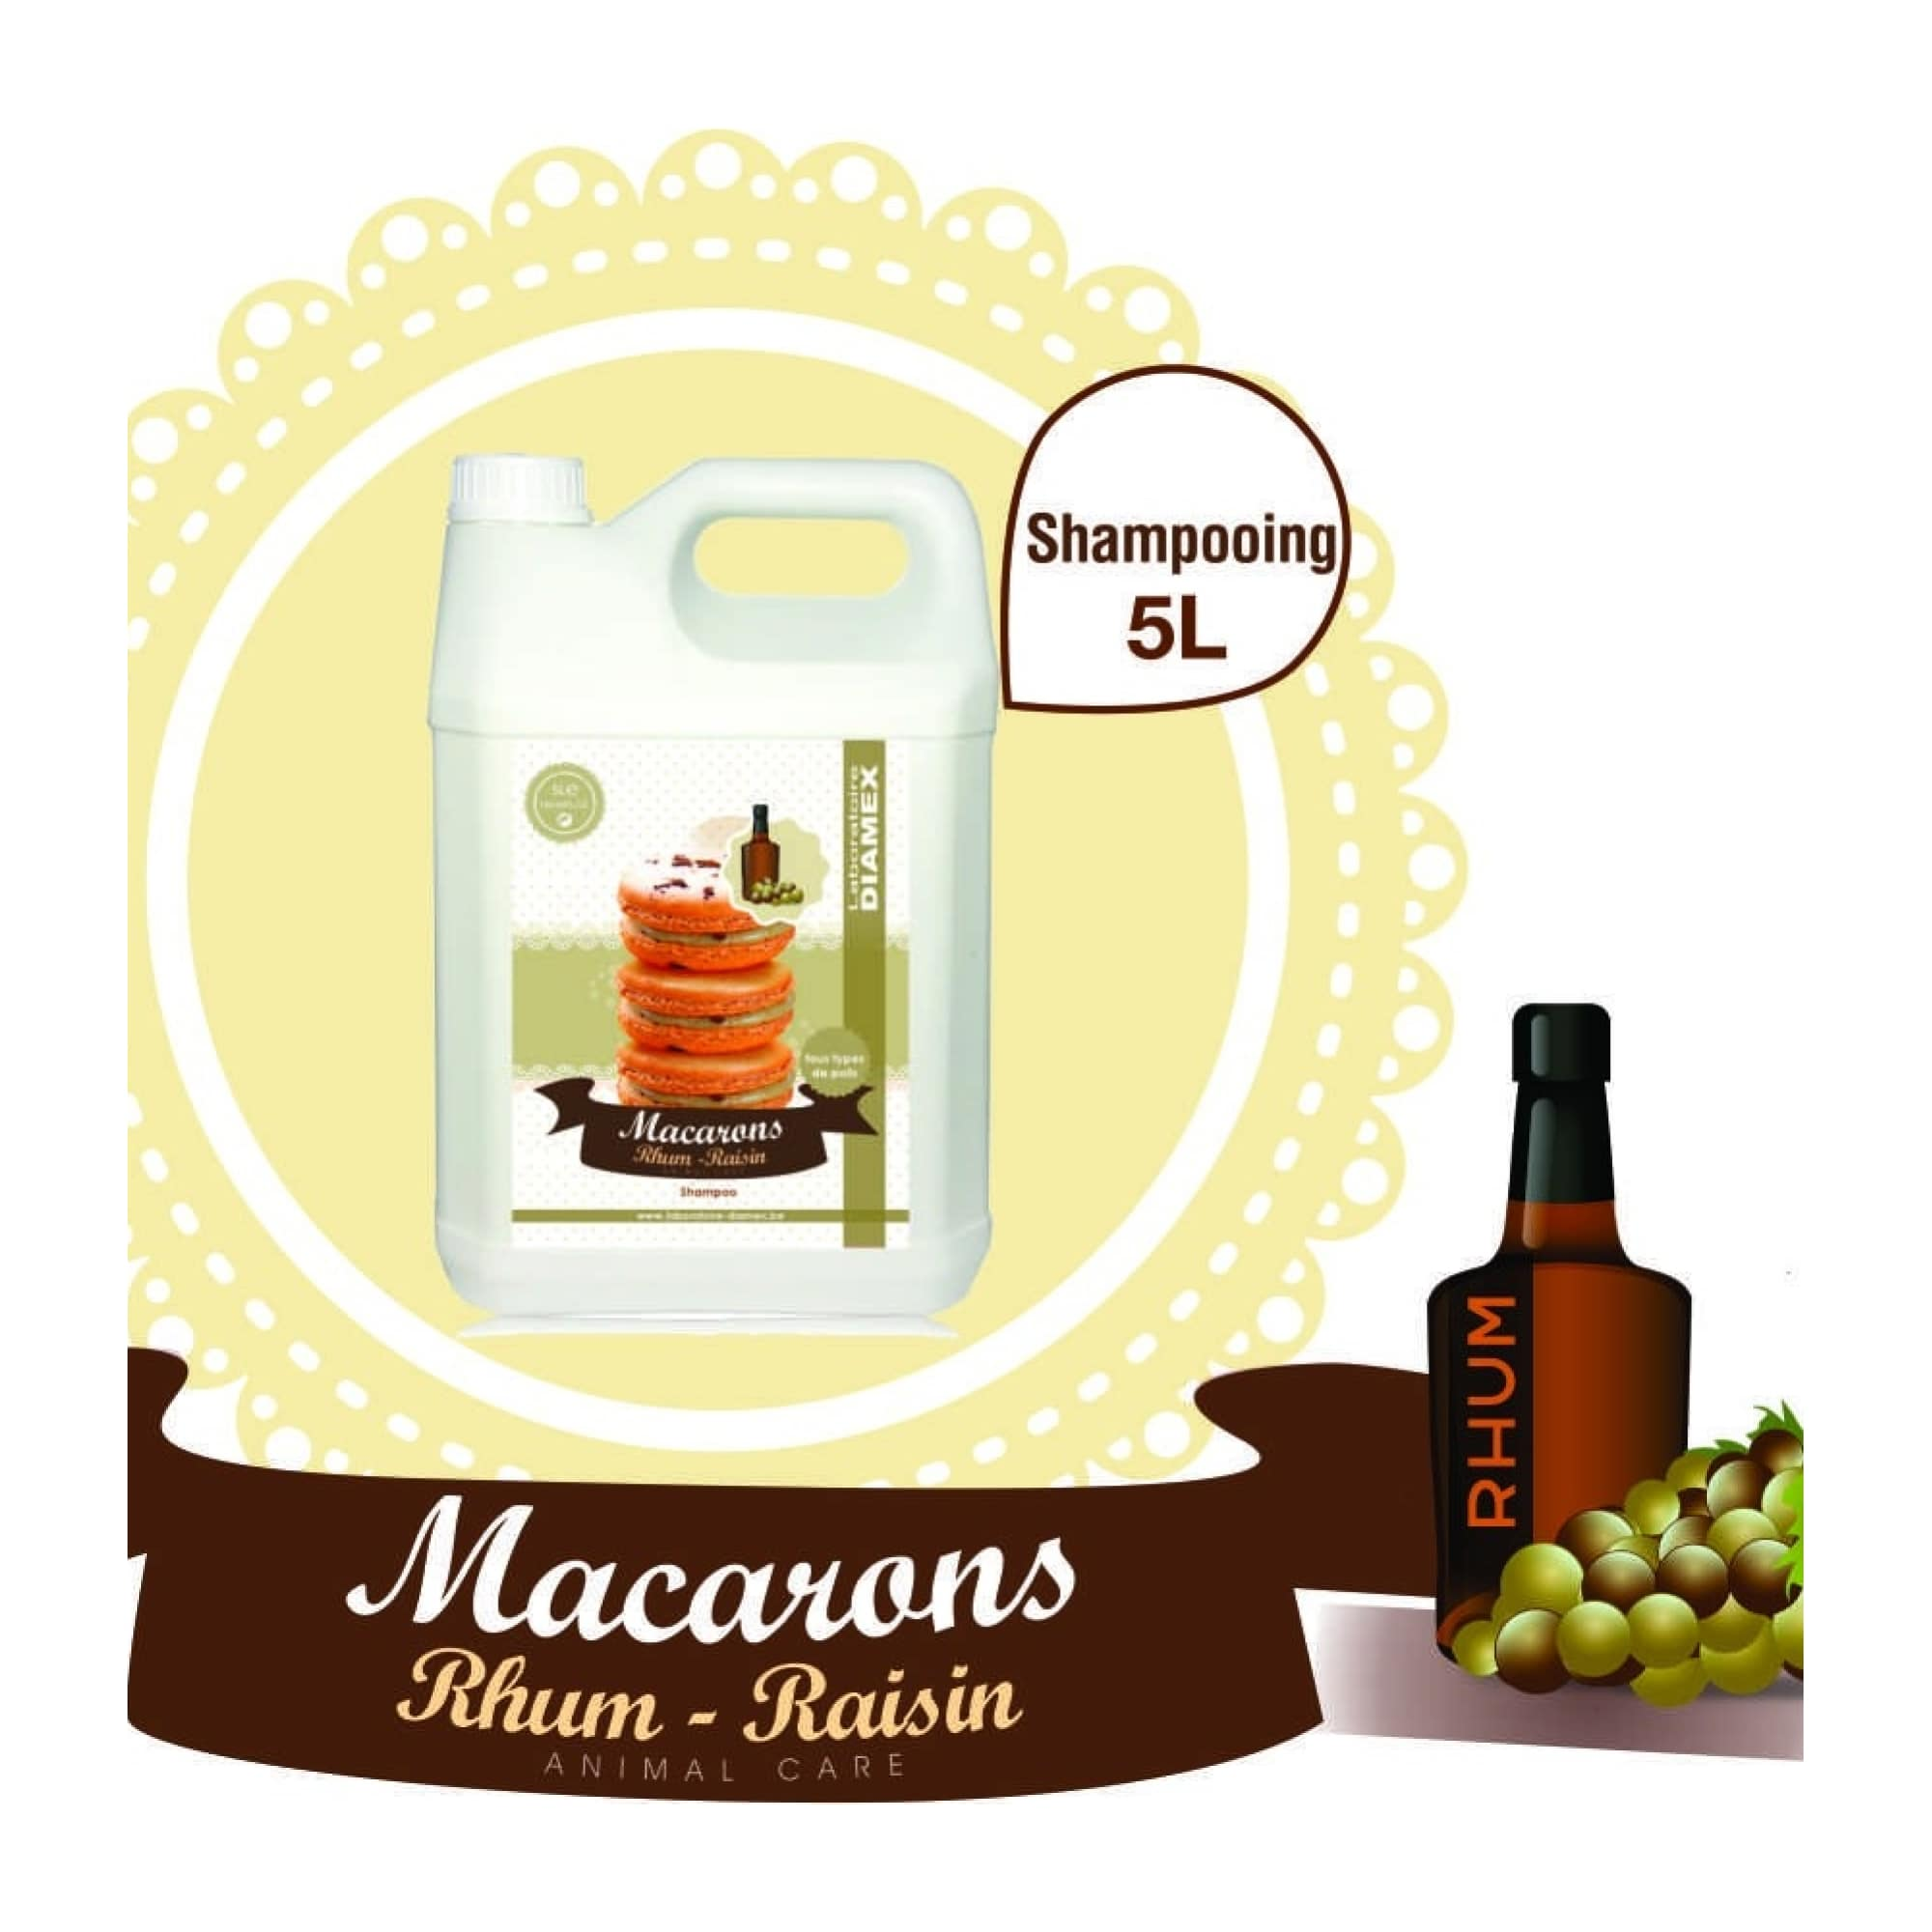 Shampooing Diamex macarons rhum-raisin